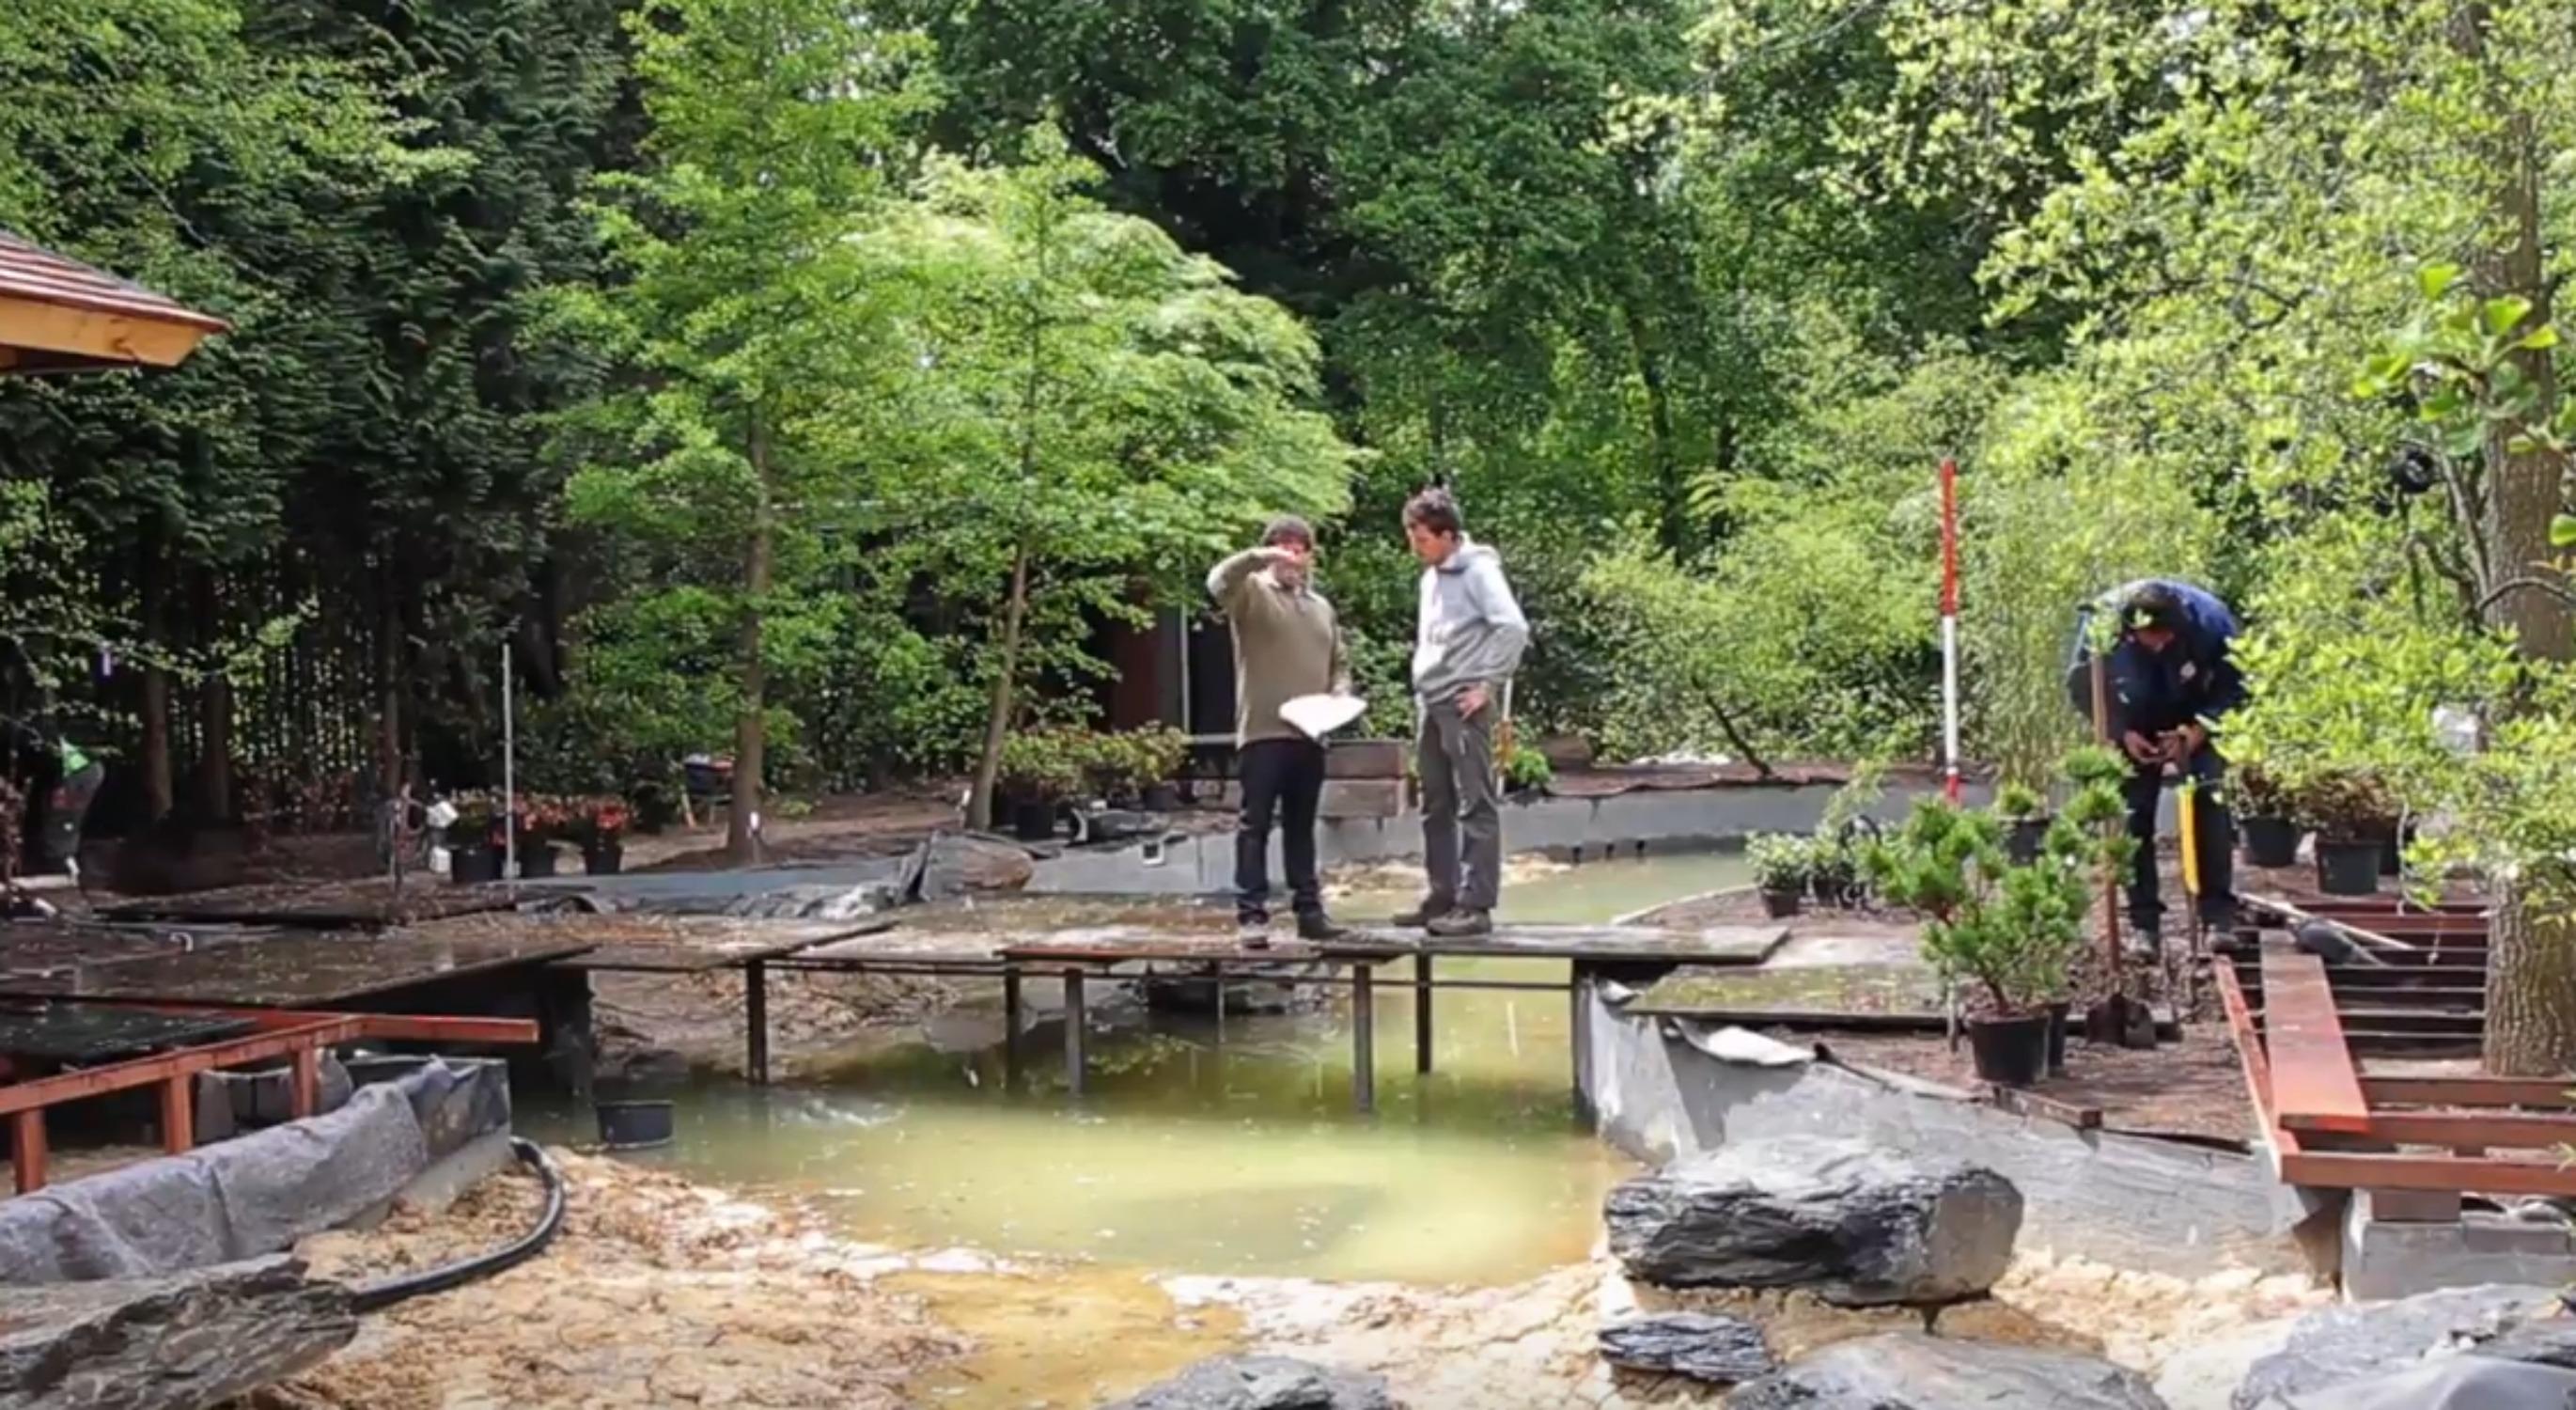 Japanese Water Garden by Van Mierlo Tuinen (NL)